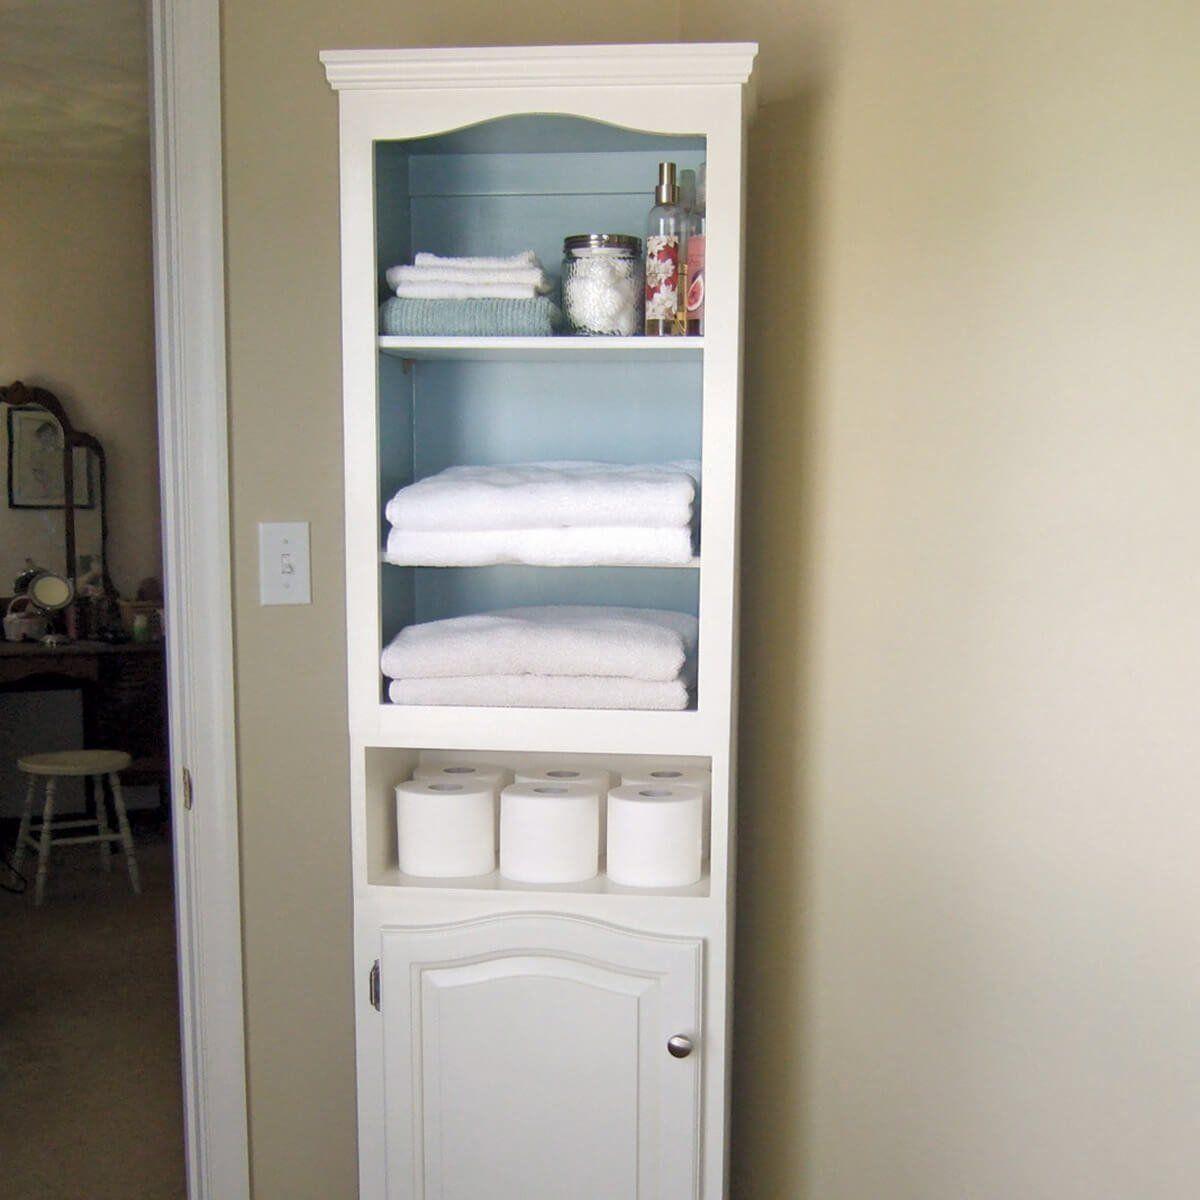 14+ Tall bathroom storage cabinets ideas in 2021